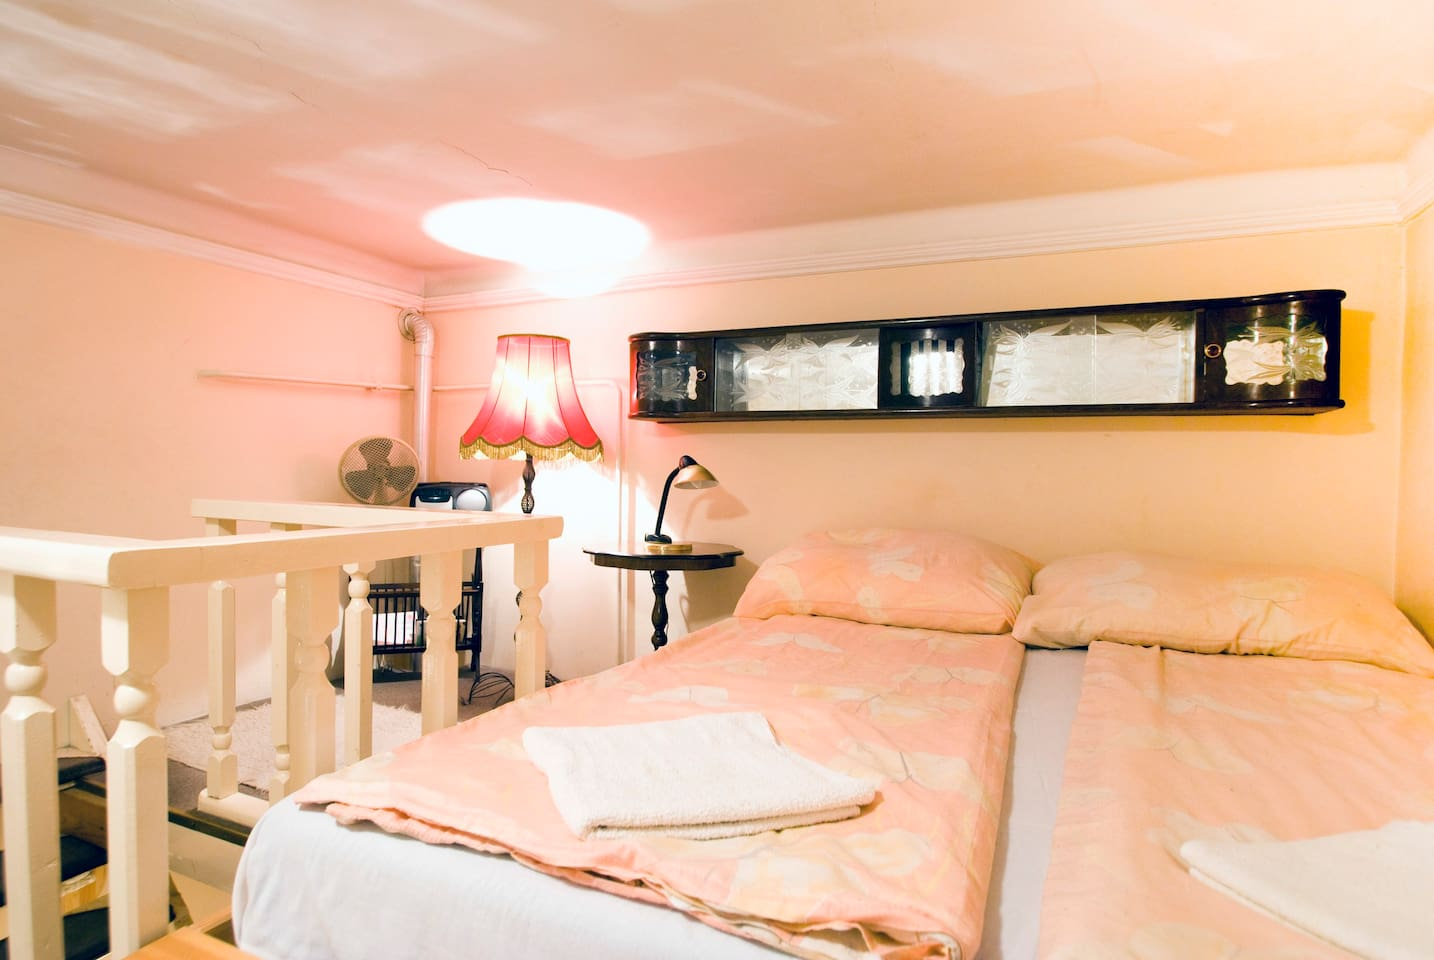 Lovely nest apartment at Vaci utca!